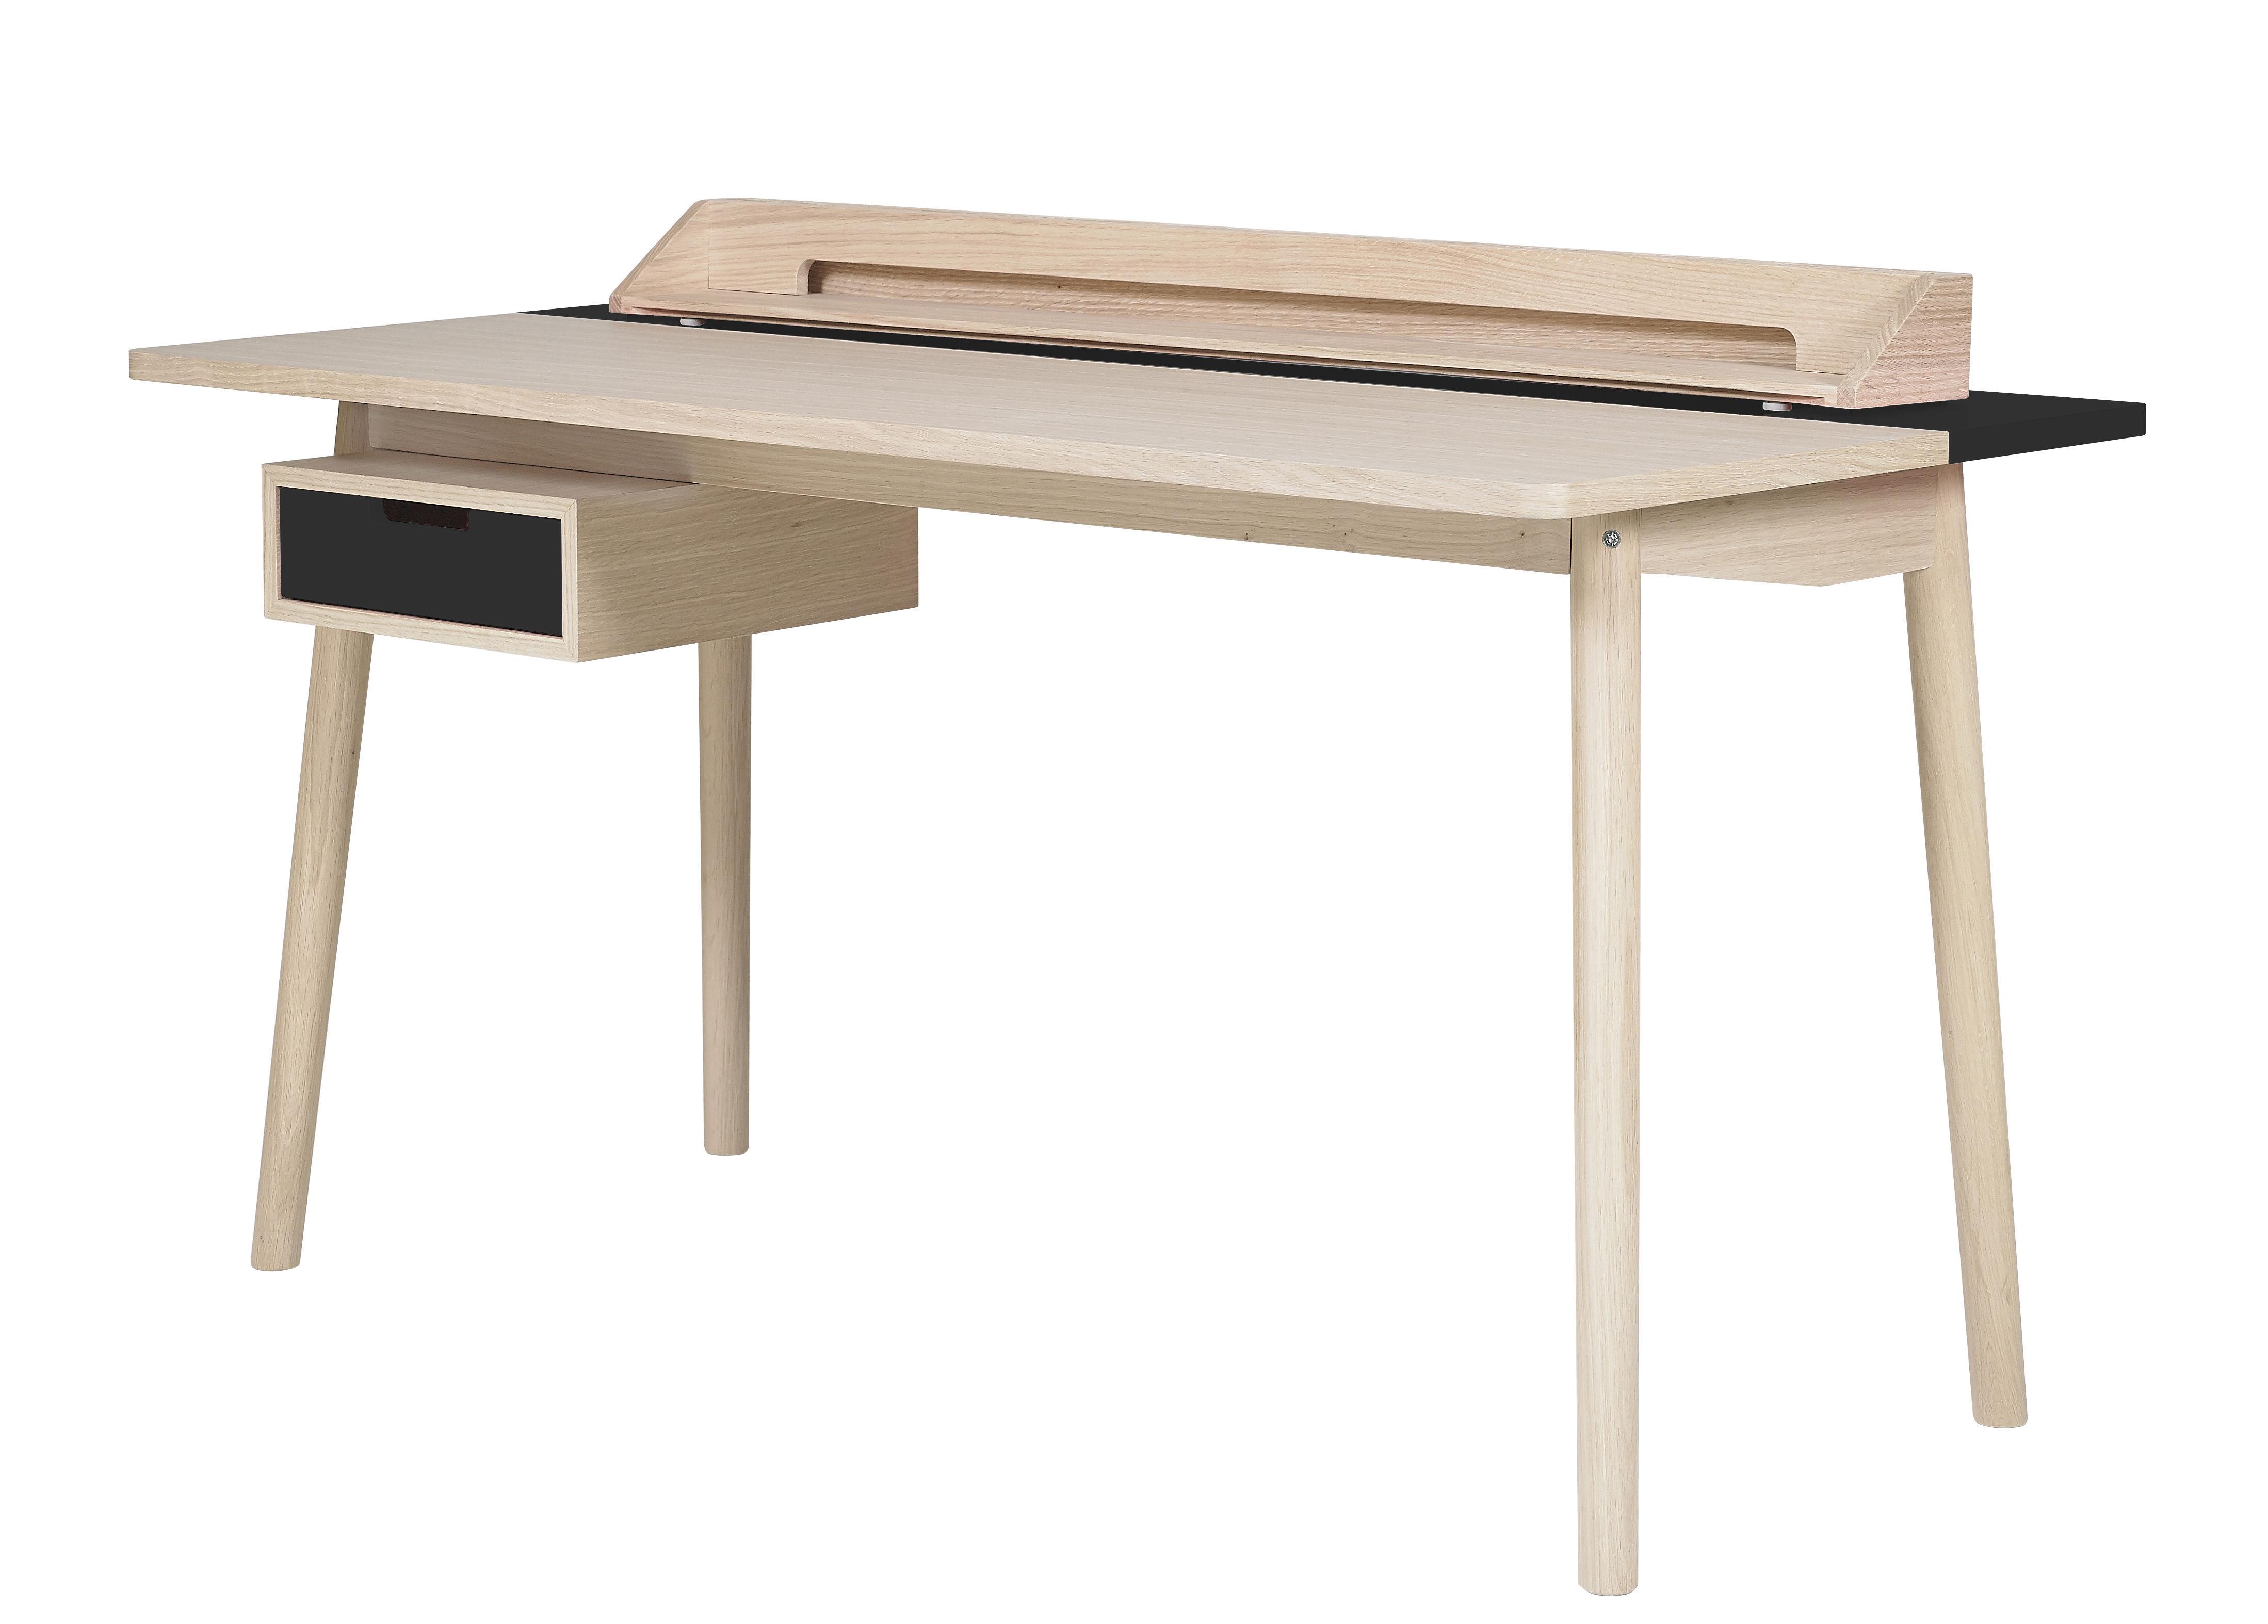 Furniture - Office Furniture - Honoré Desk by Hartô - Grey slate - MDF veneer oak, Solid oak